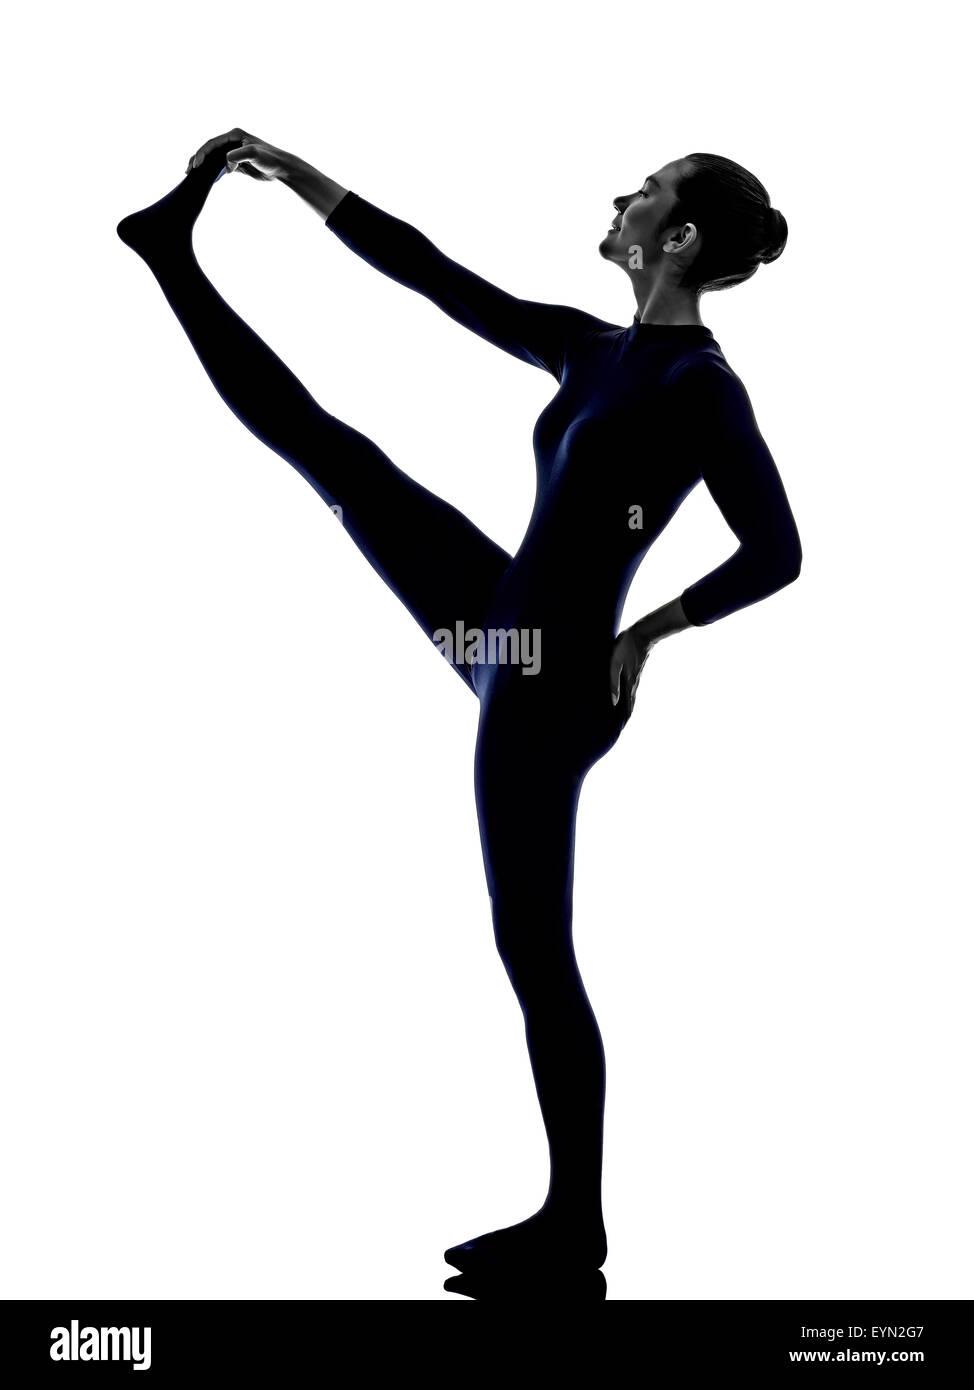 woman exercising Hasta Padangusthasana hand to big toe pose yoga silhouette shadow white background - Stock Image